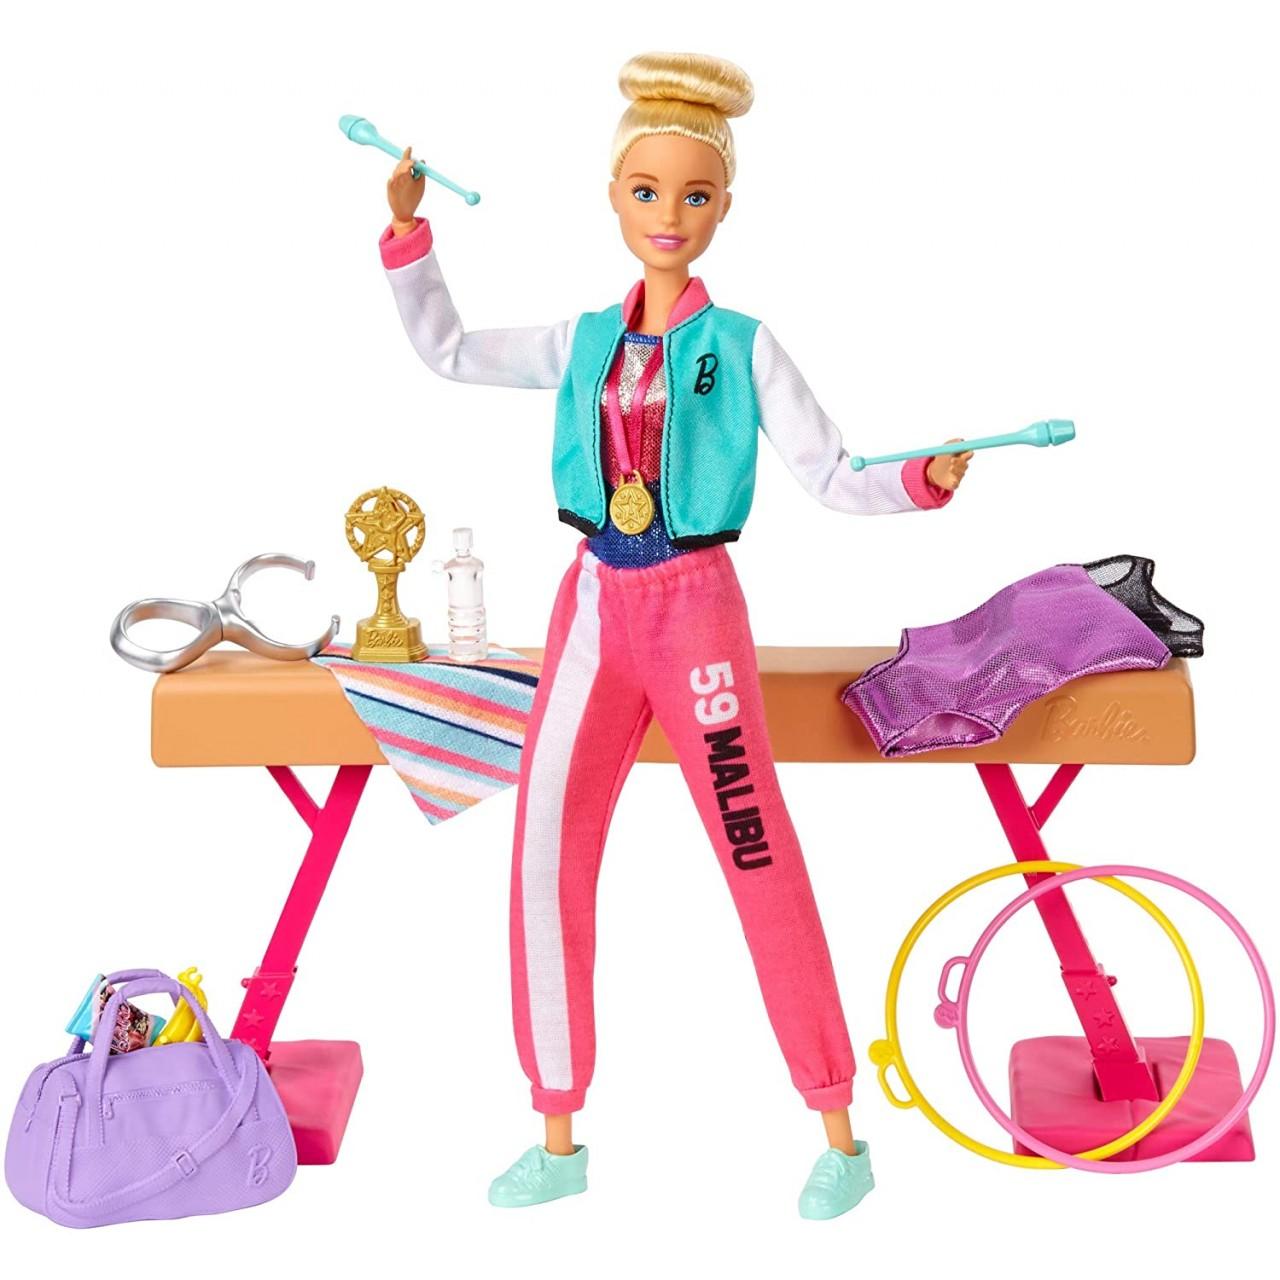 Набір Barbie You can be Гімнастка GJM72 від Mattel